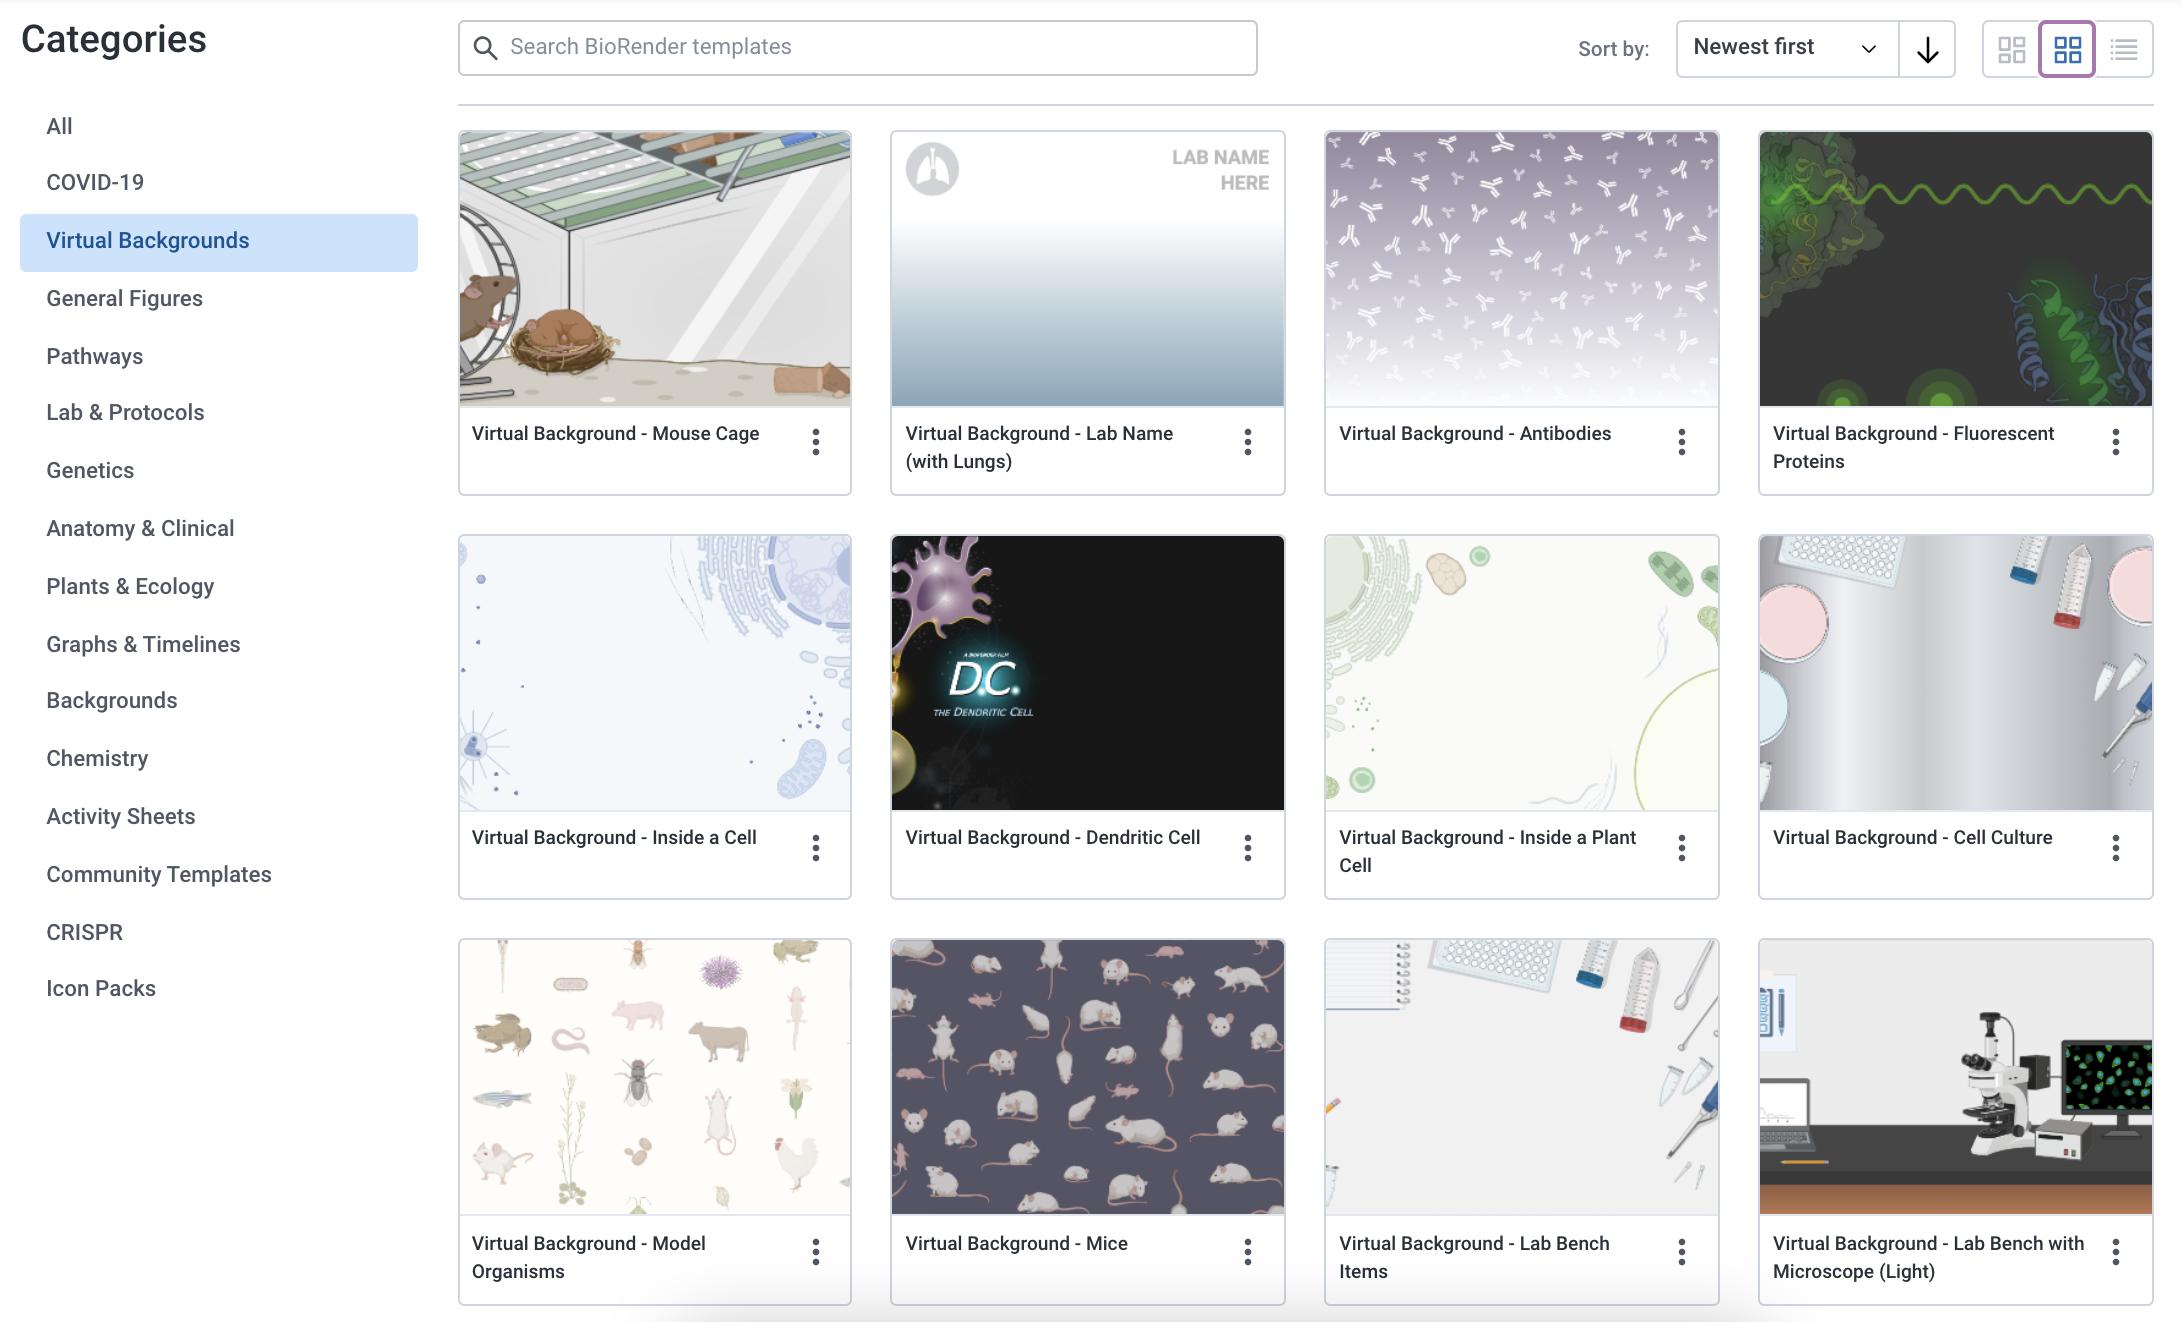 BioRender Zoom Backgrounds Template Gallery